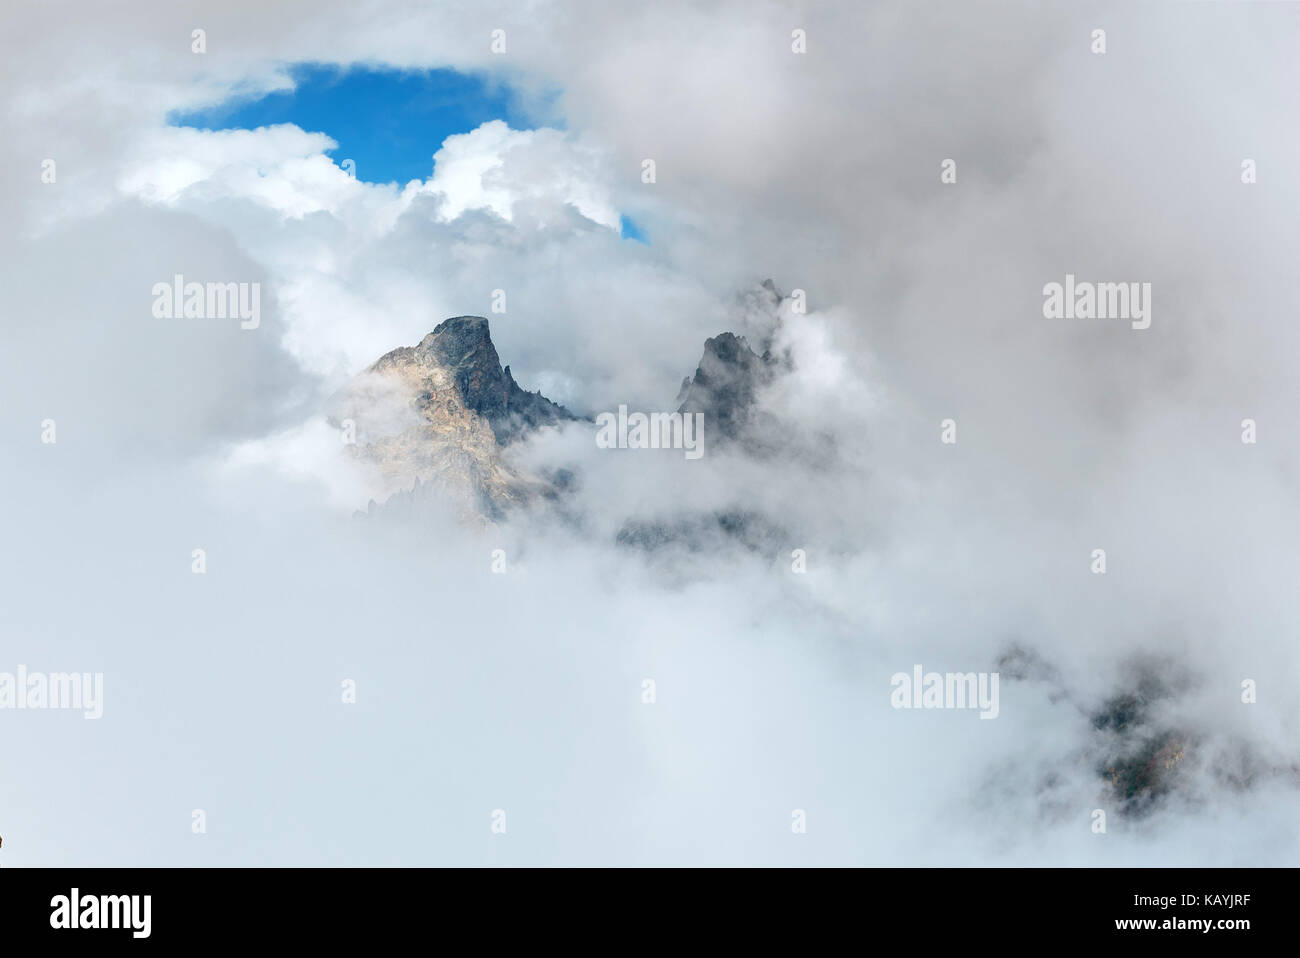 Dichter Nebel auf dem Pass Goulet. Georgien, Kaukasus Swaneti. Stockbild